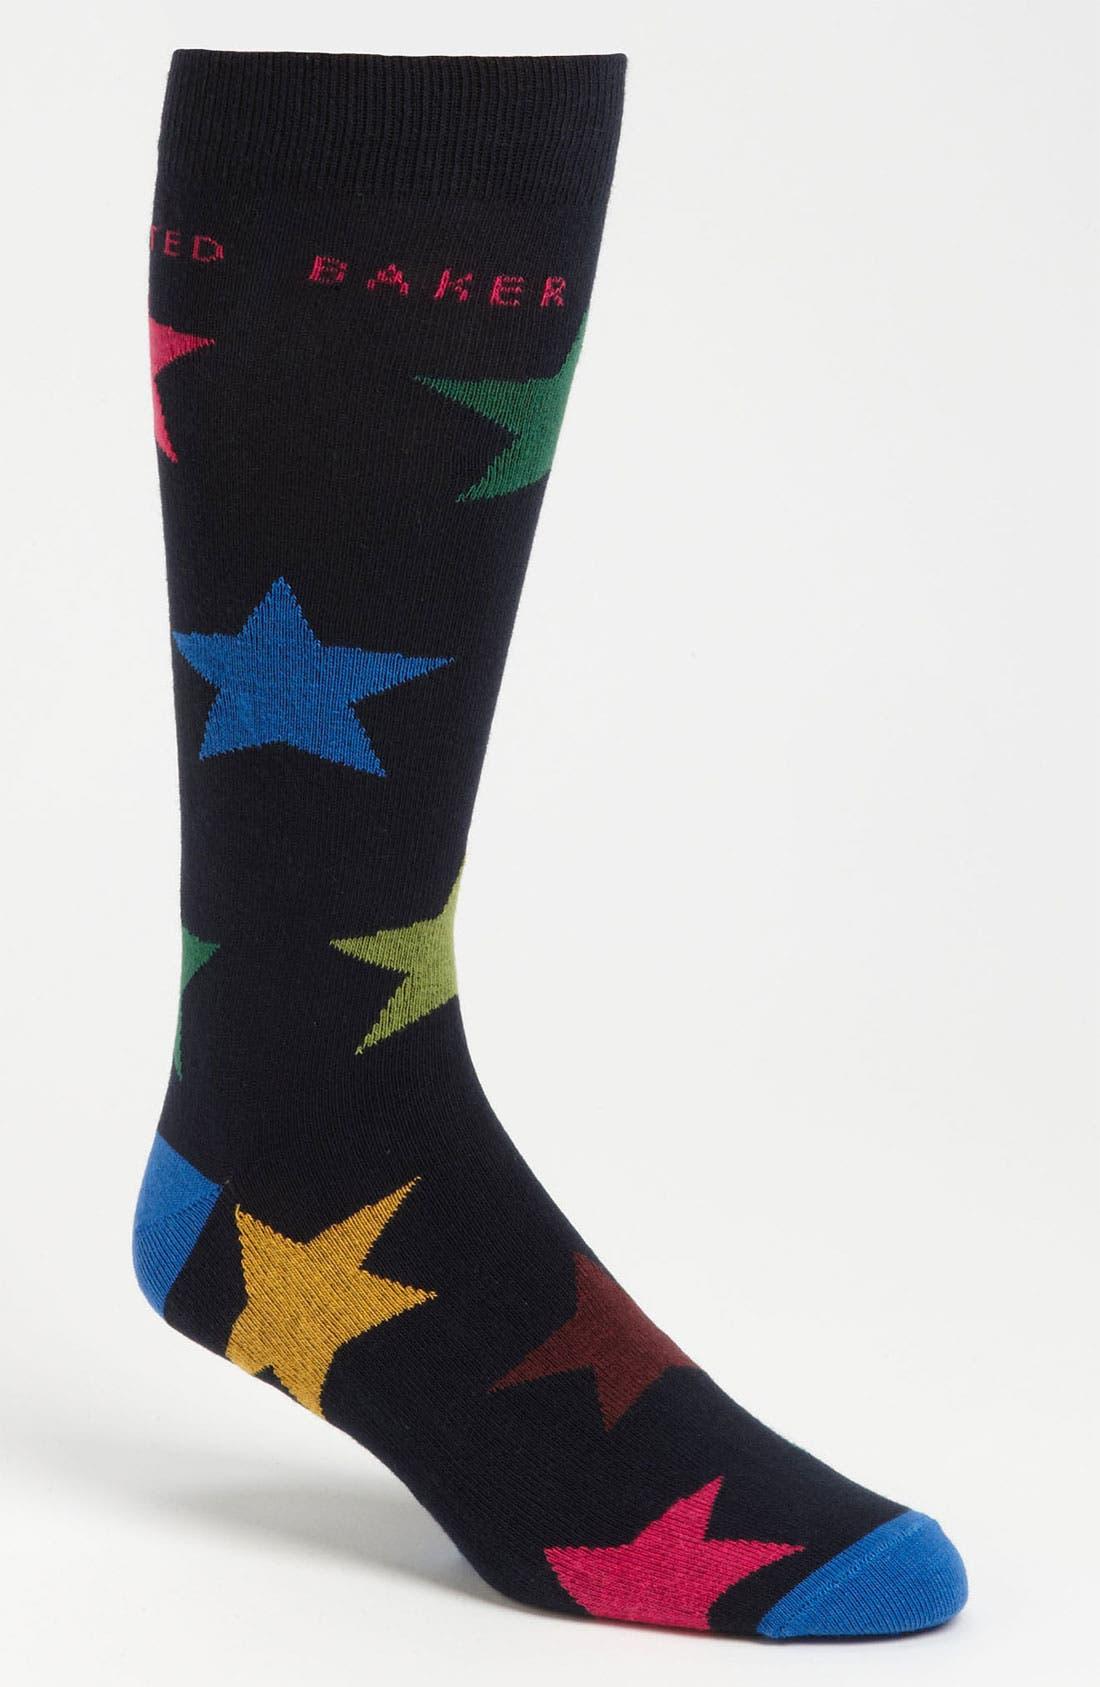 Alternate Image 1 Selected - Ted Baker London 'Big Star' Socks